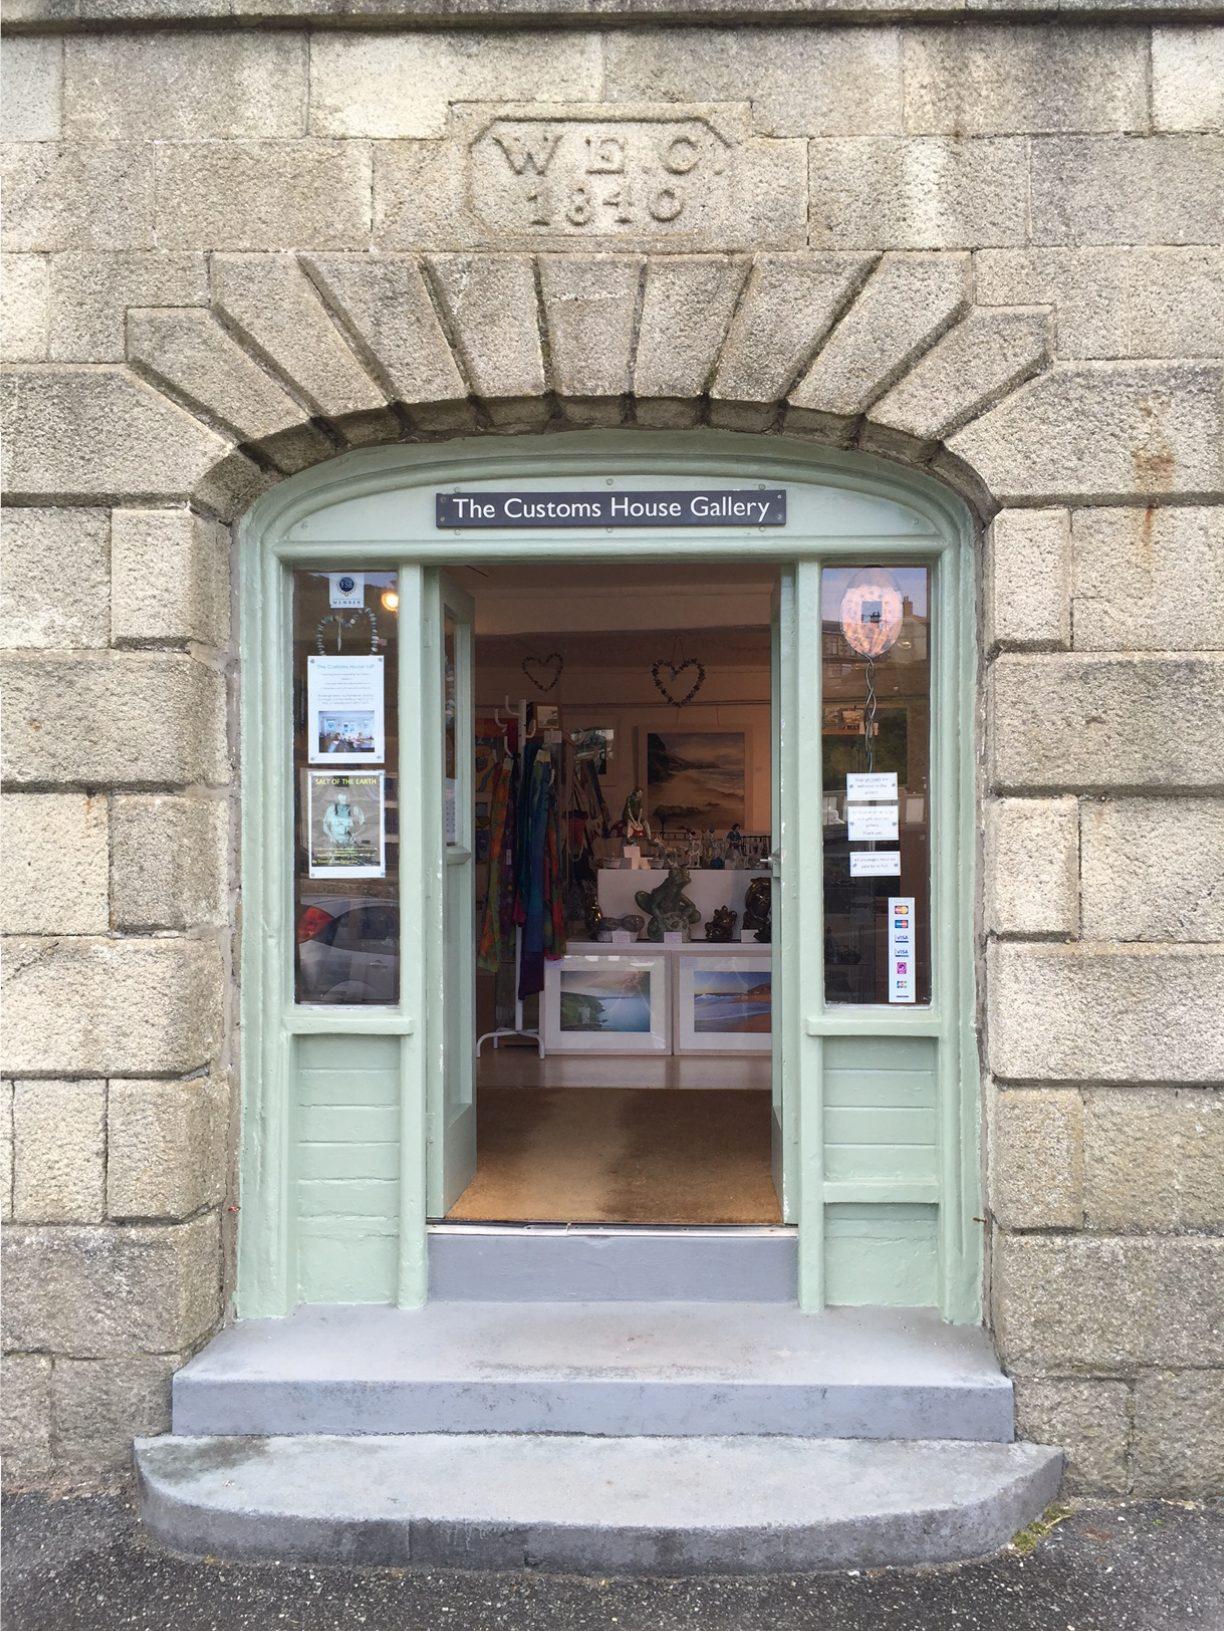 Customs House Gallery